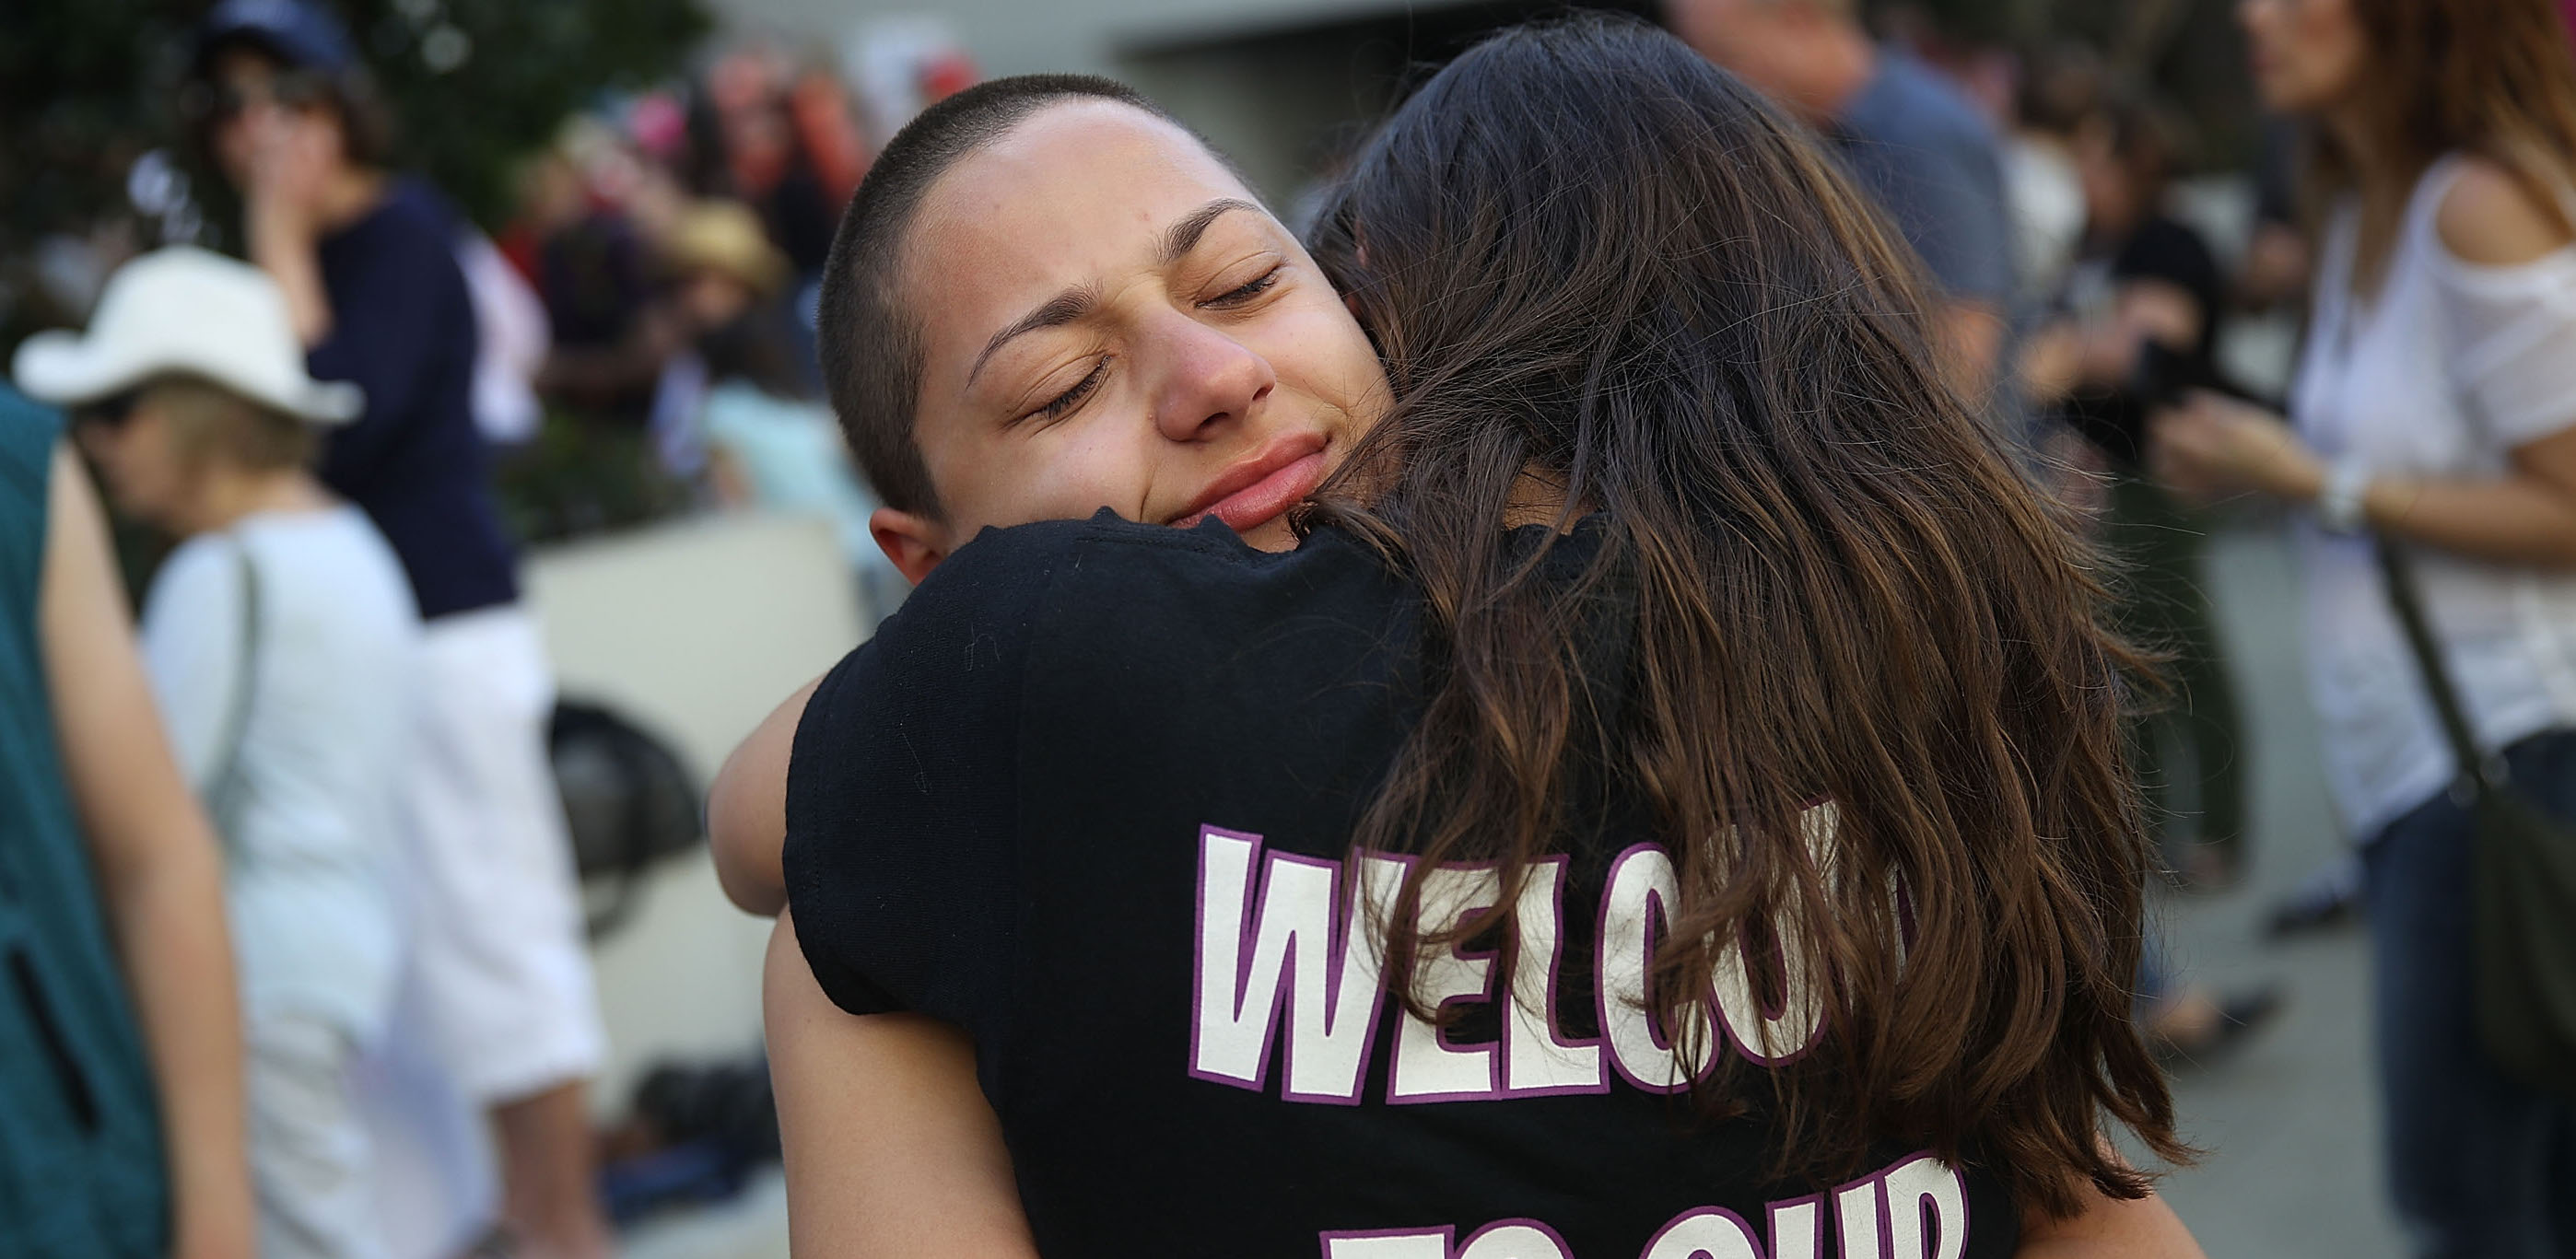 School Shooting Survivor Emma González Is Leading the New Gun Control Movement